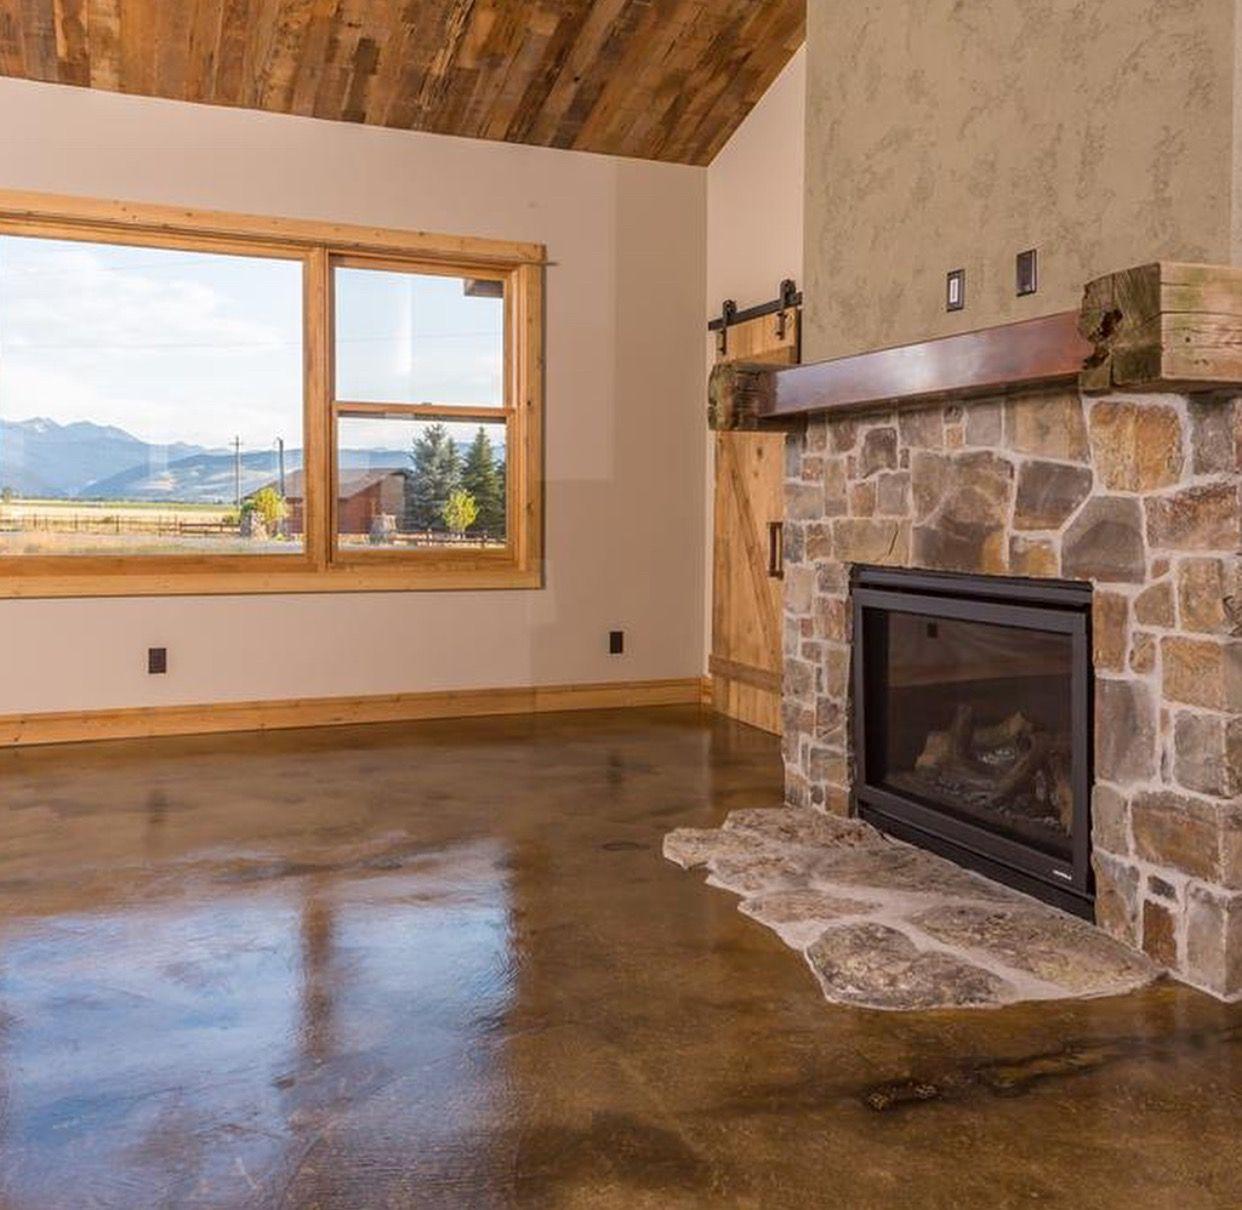 Montana Ranch House By Suyama Peterson Deguchi: Idea By Joshua J. Cadwell On Future Dwellings.